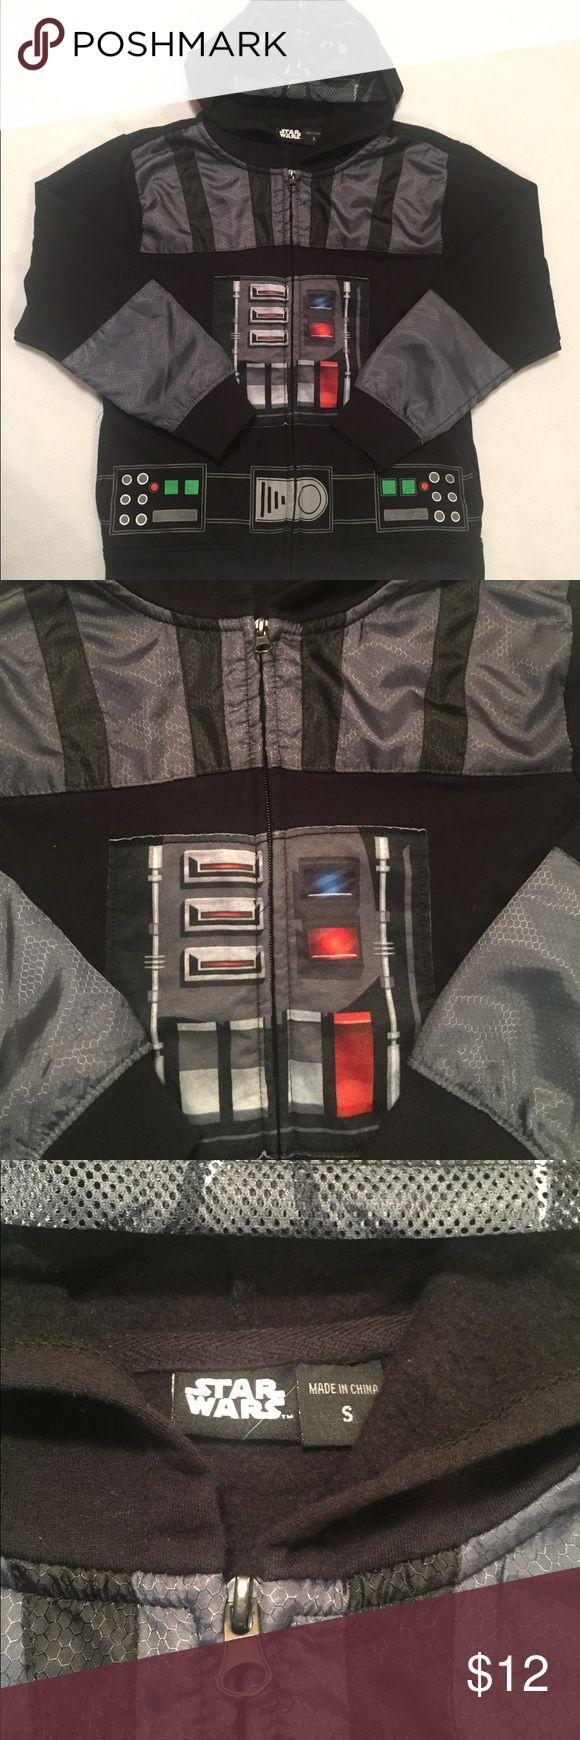 Star Wars Kids Jacket, size small Star Wars Jacket. Good used condition. 🍓 Star Wars Jackets & Coats